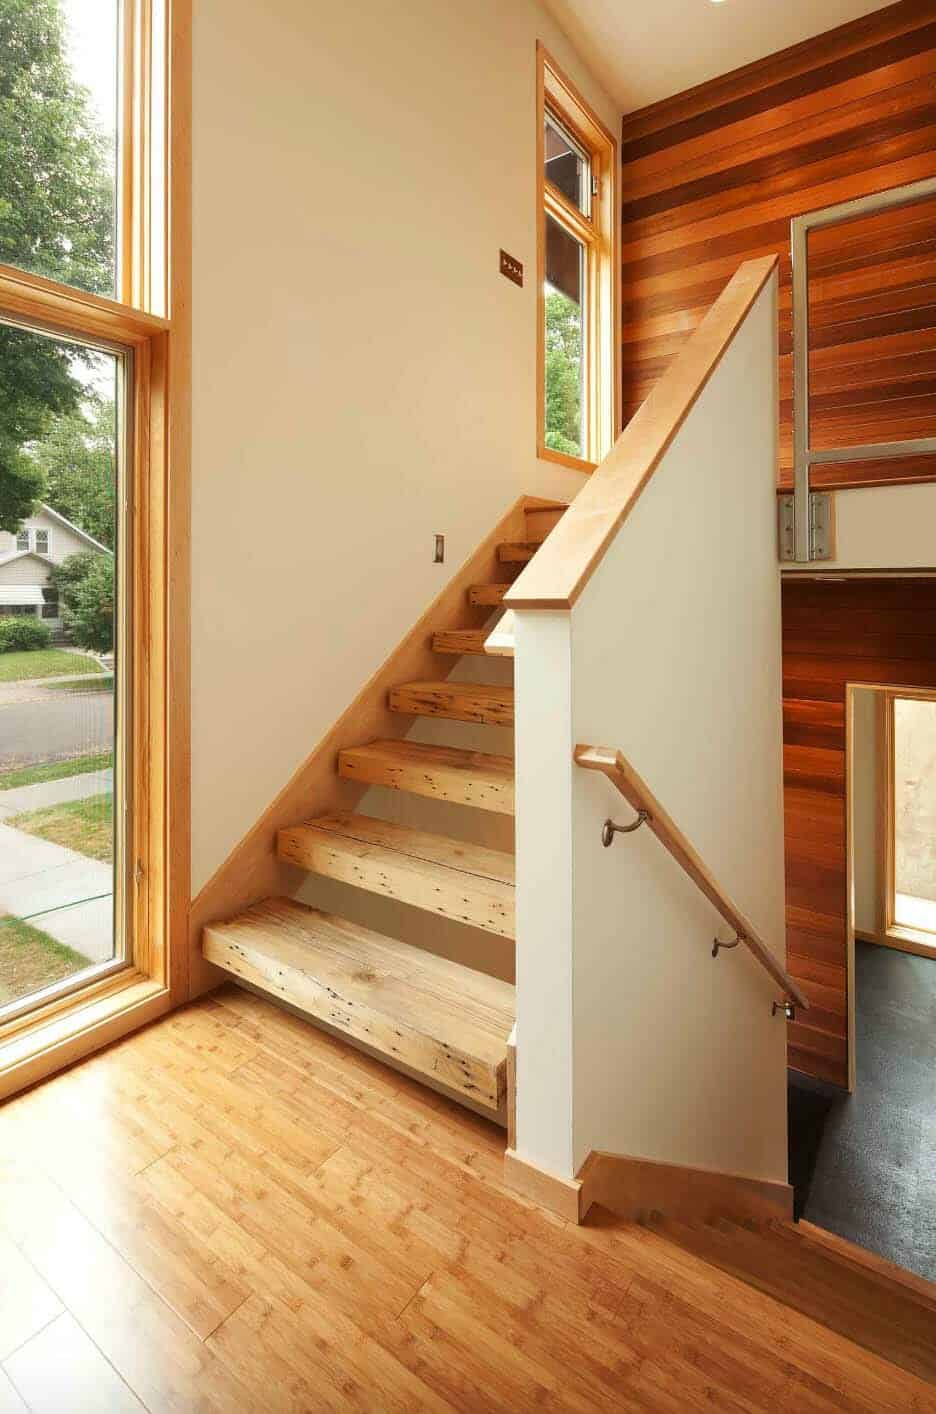 Modern Sustainable Home-LEED-SALA Architects-07-1 Kindesign